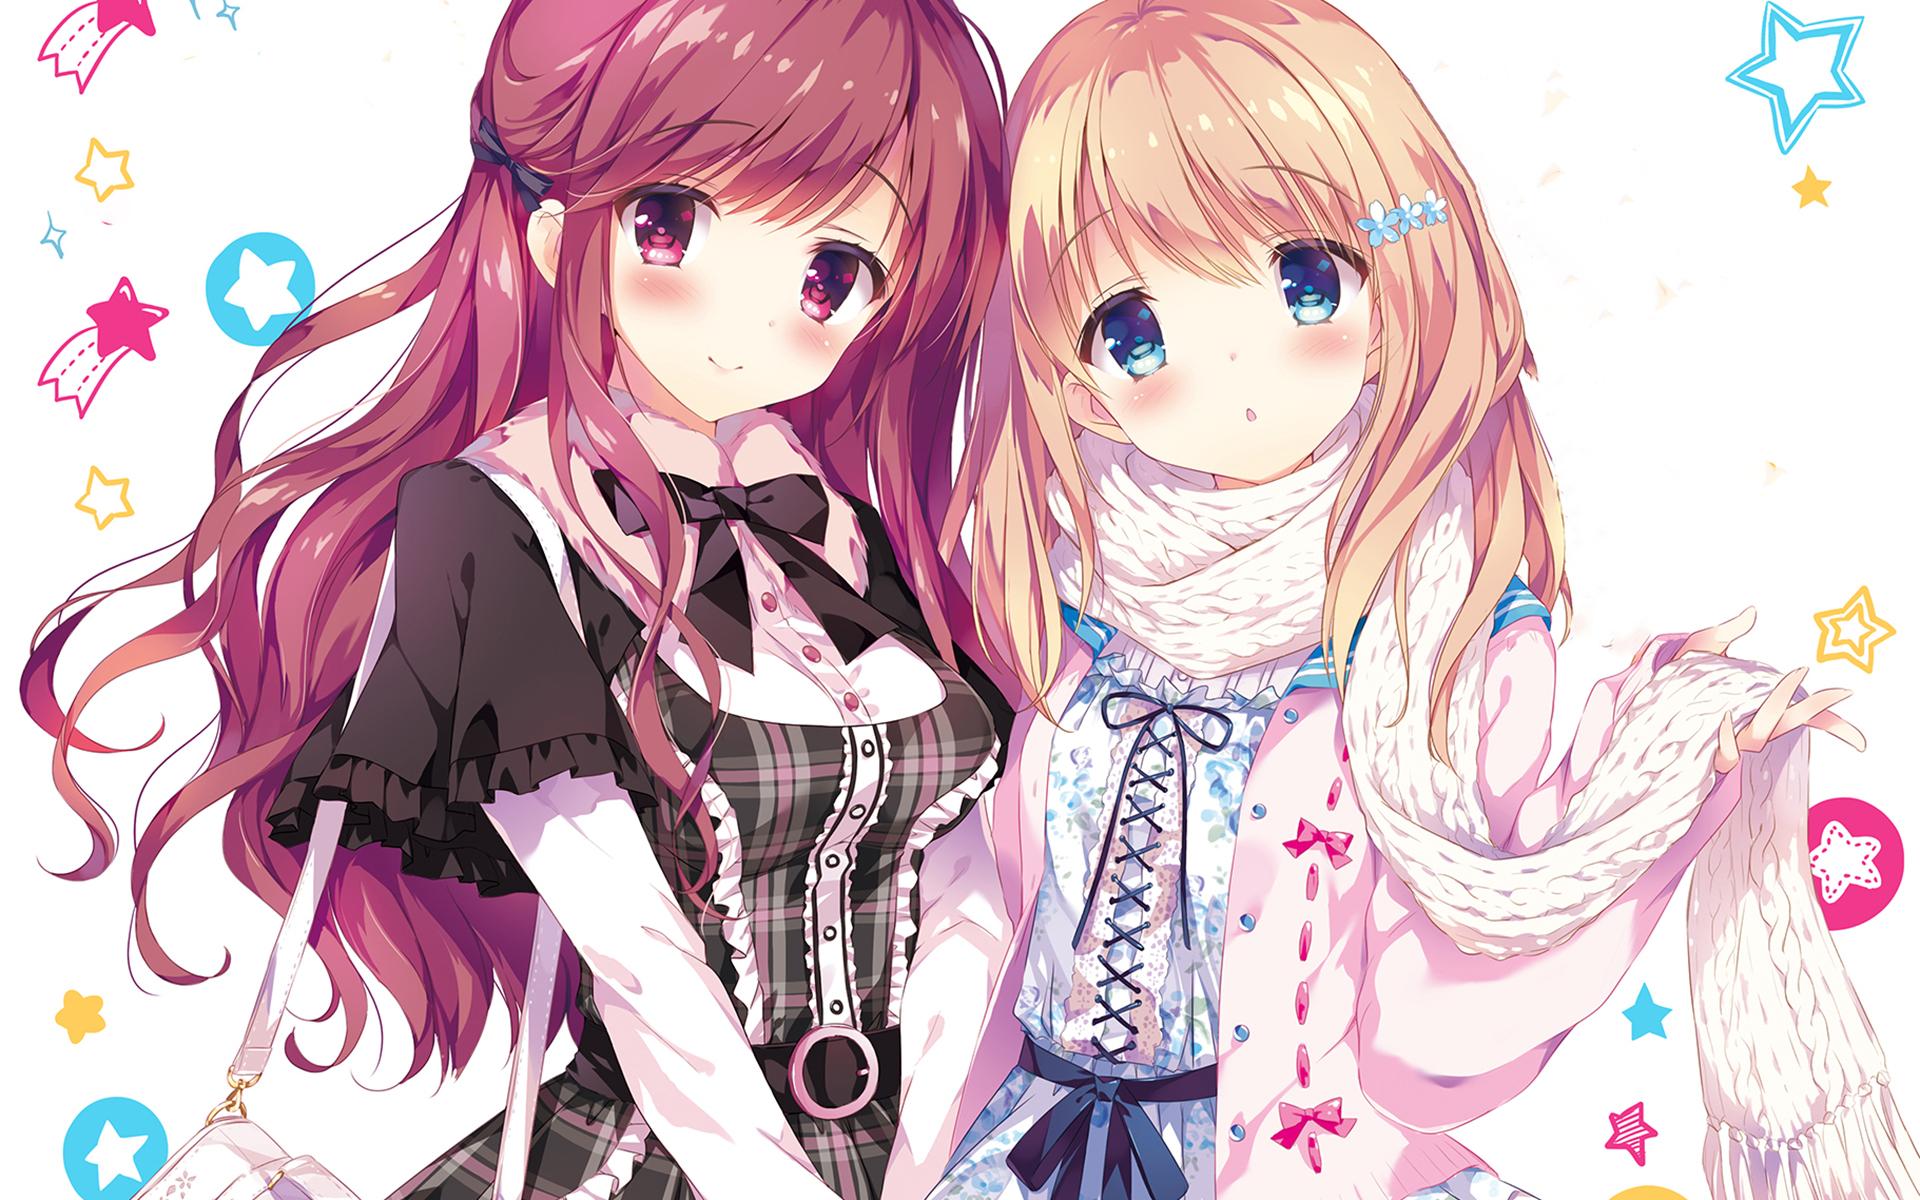 Desktop Wallpaper Cute Long Hair Anime Girls Friends Hd Image Picture Background 65e492